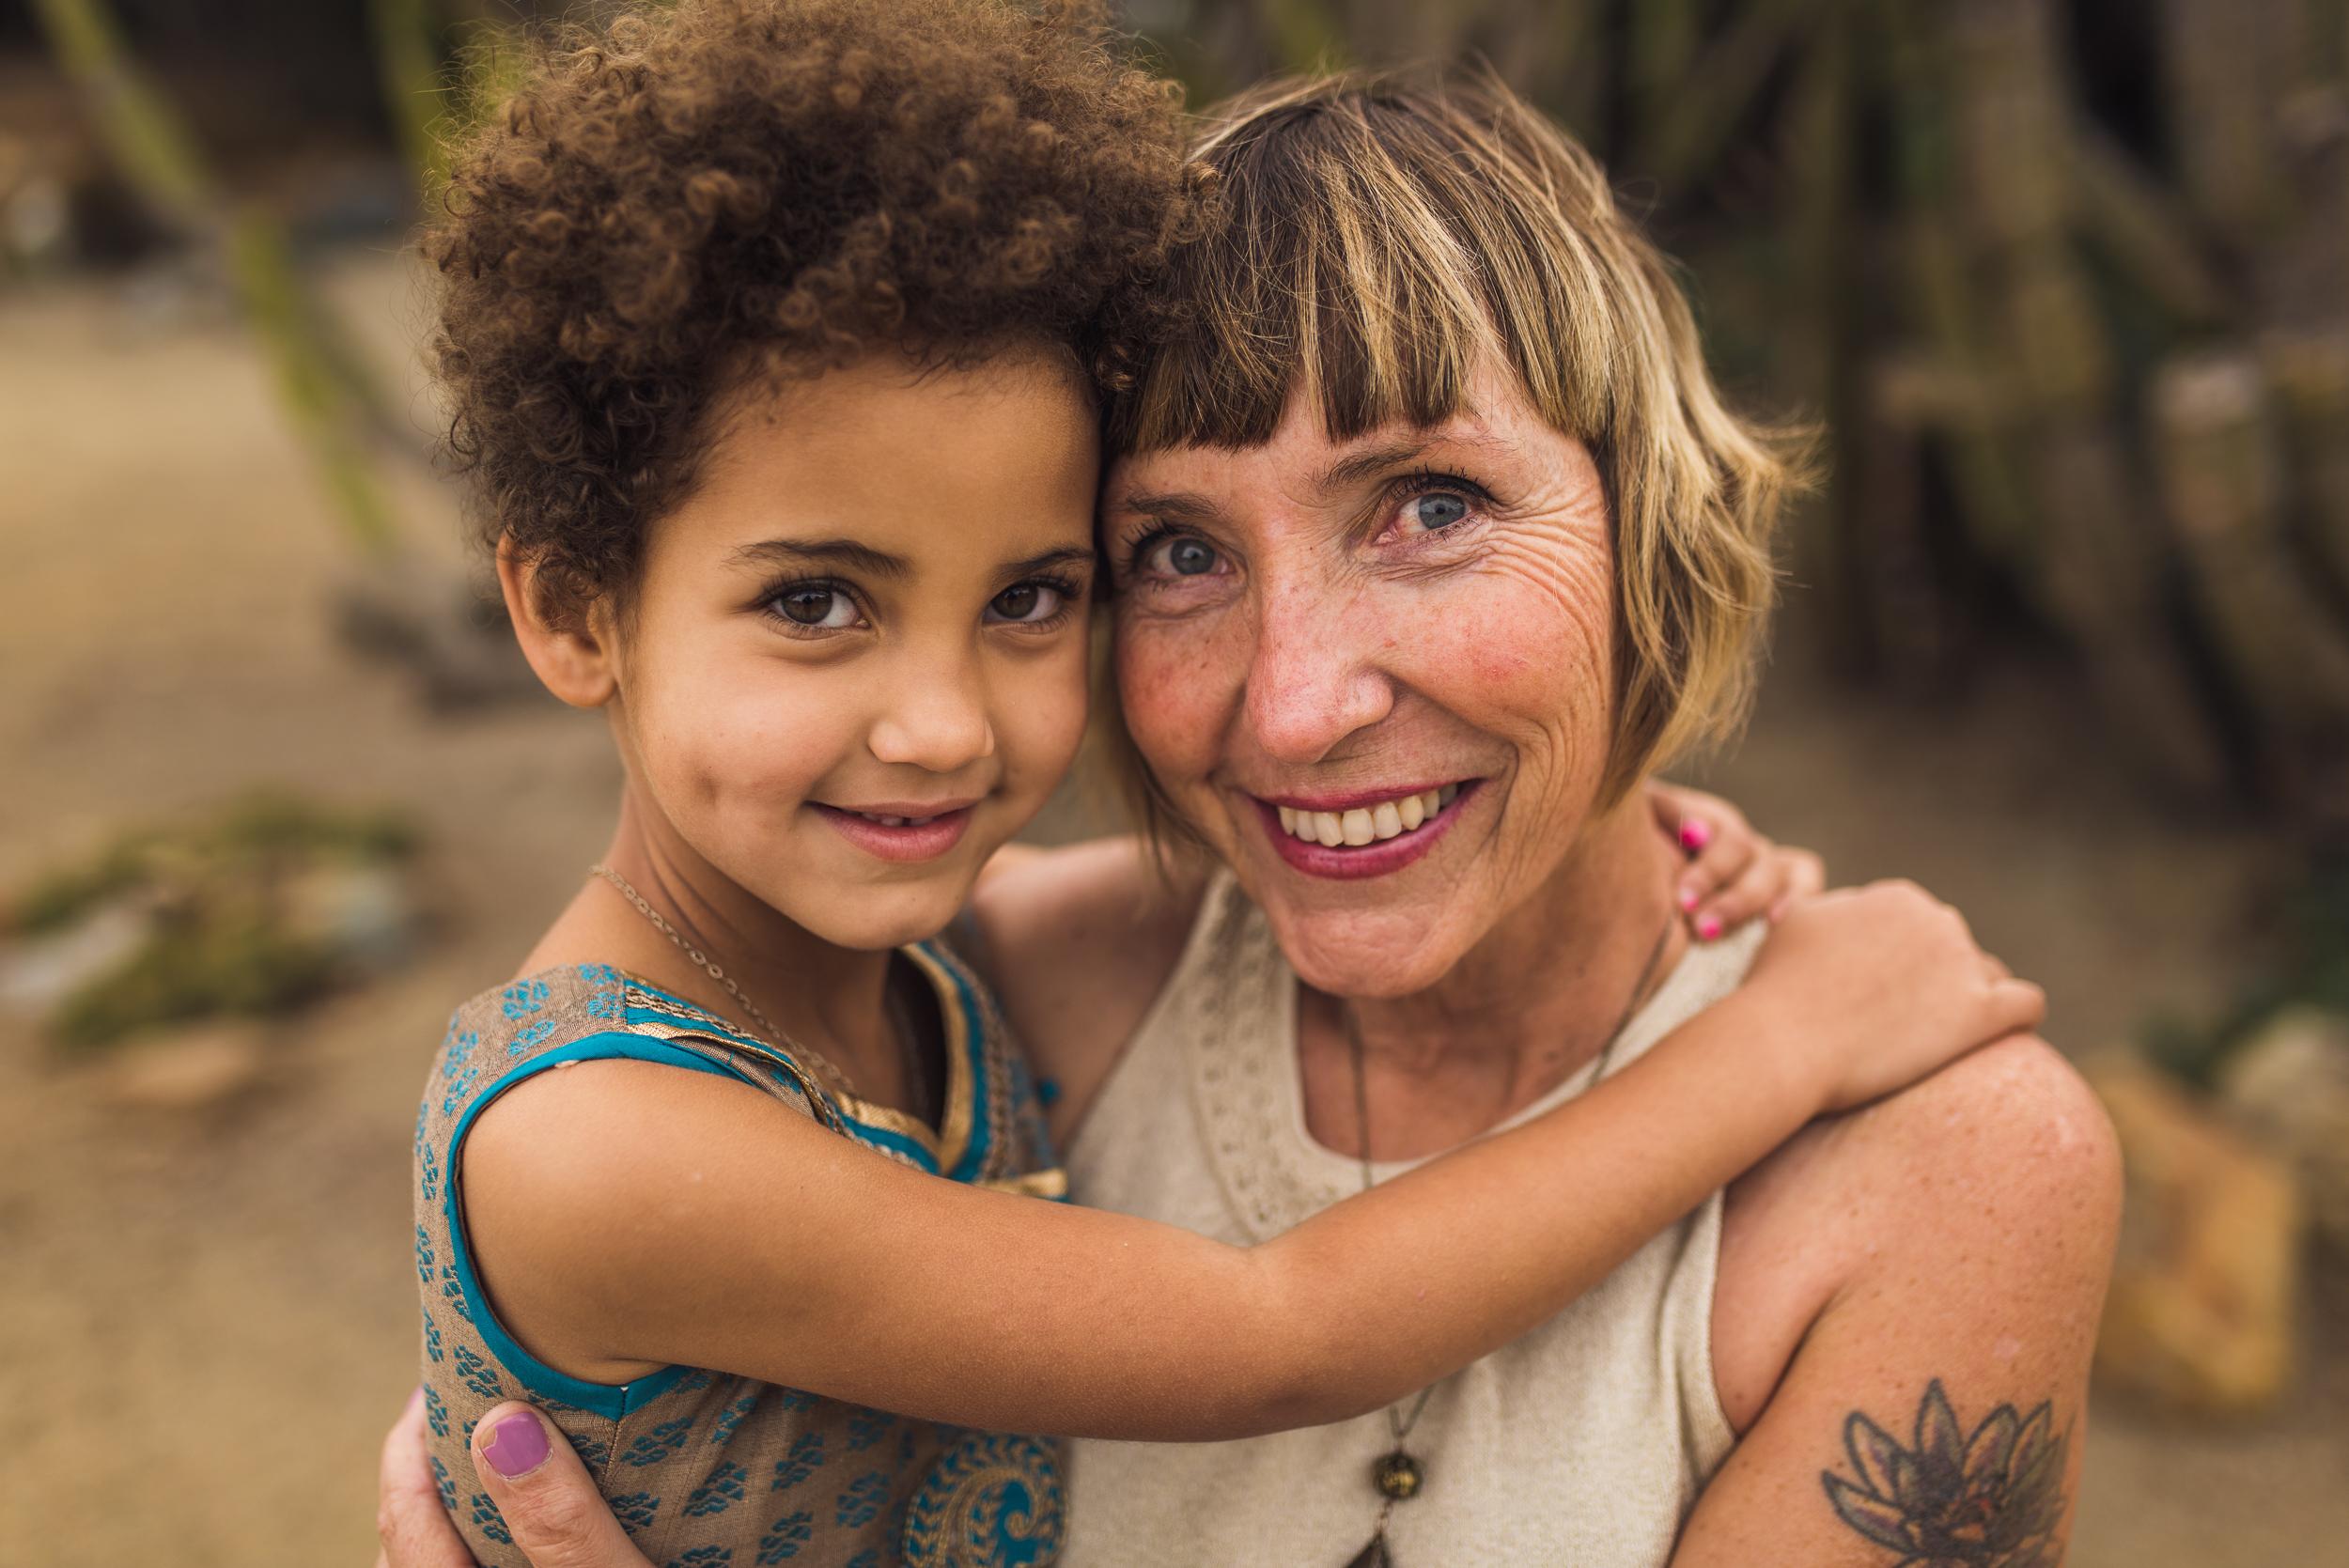 2018-San-Diego-Family-Lifestyle-Newborn-Travel-Vacation-Photographer-Kelsey-Smith-Photography-Coronado-La-Jolla-Encinitas-Solana-Beach-Del-Mar-35.jpg